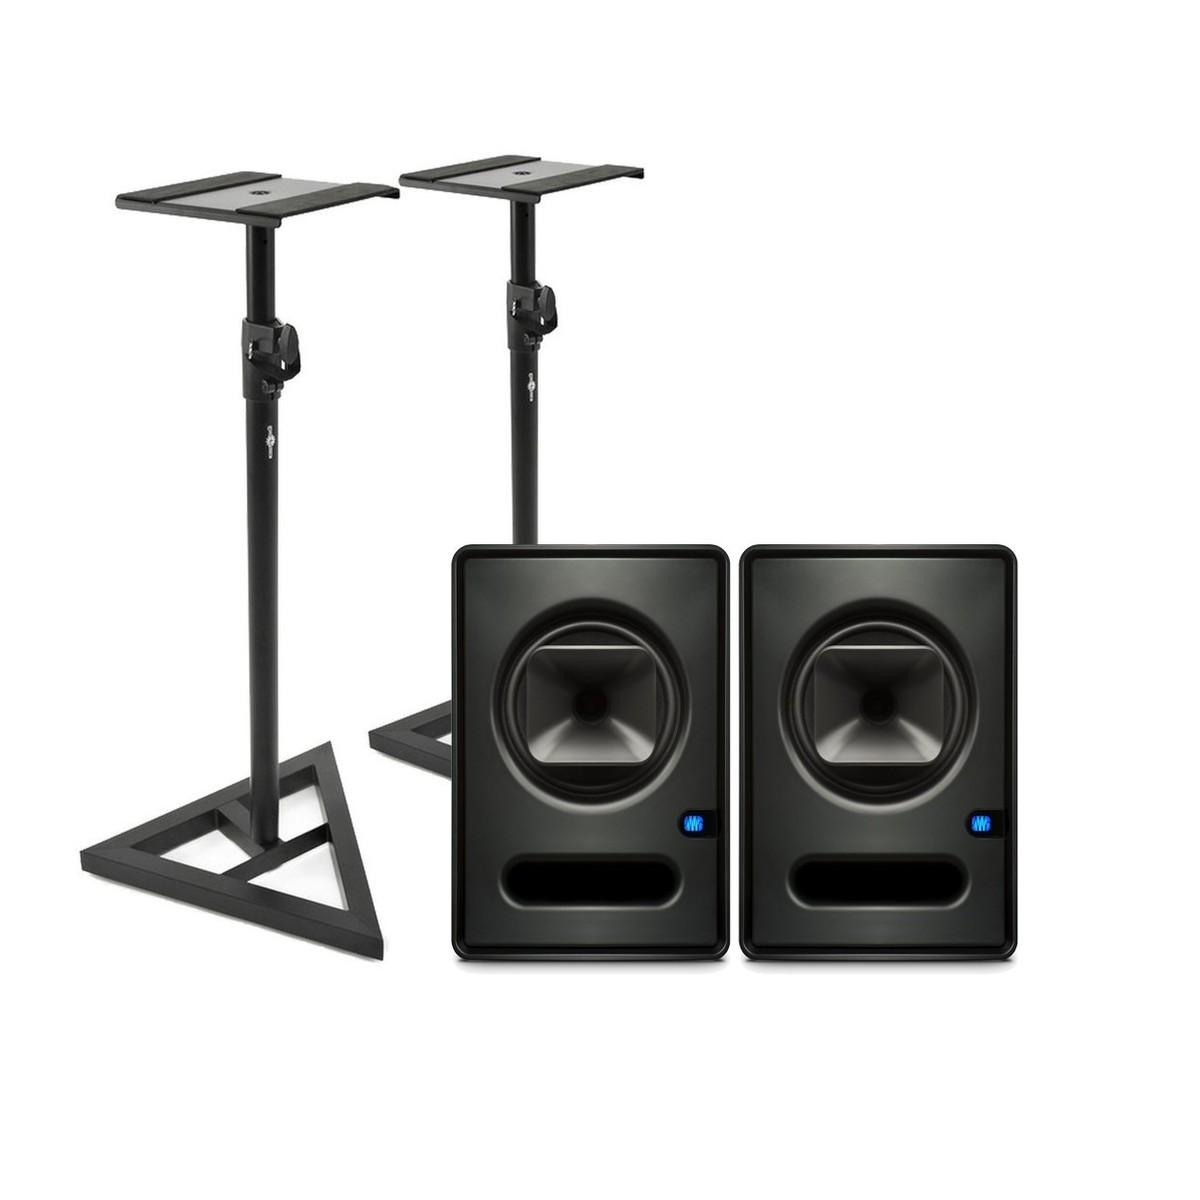 PreSonus Sceptre S6 CoActual Studio Monitors (Pair) with Stands